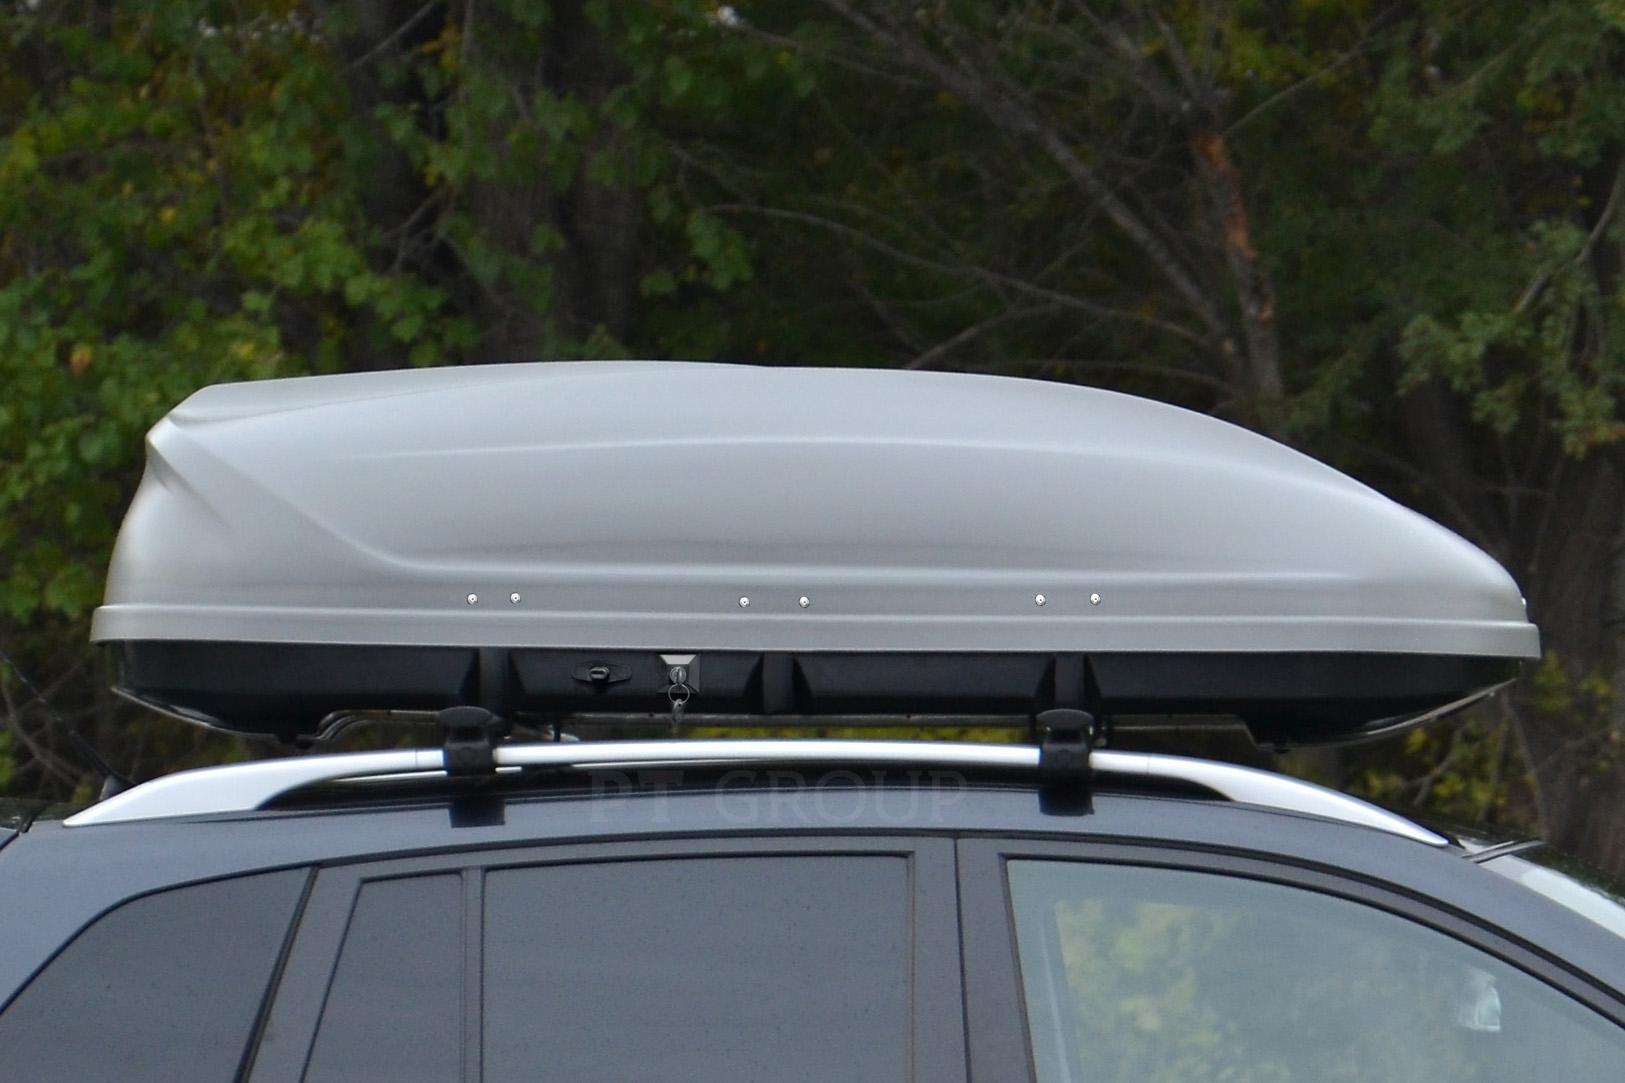 Автомобильный бокс на крышу Turino 1 Серый матовый ONE (Арт.1705)